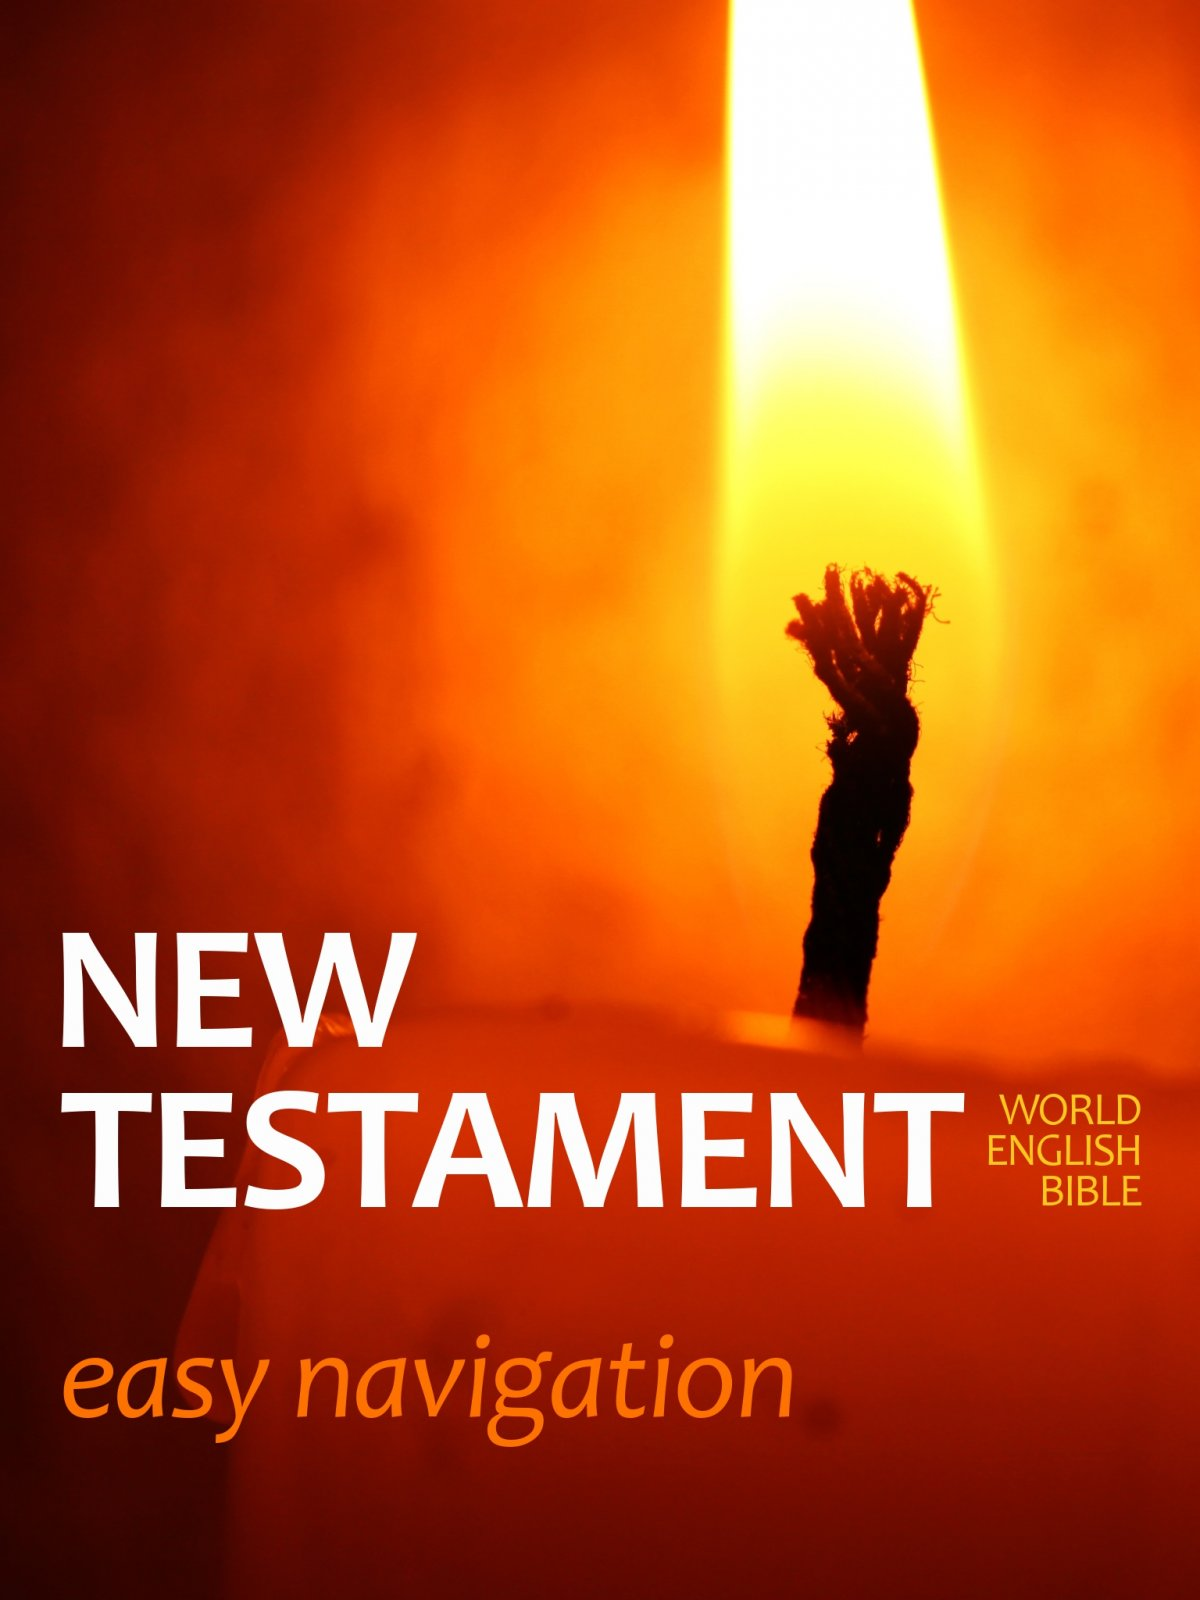 New Testament (Easy Navigation) - Ebook (Książka na Kindle) do pobrania w formacie MOBI